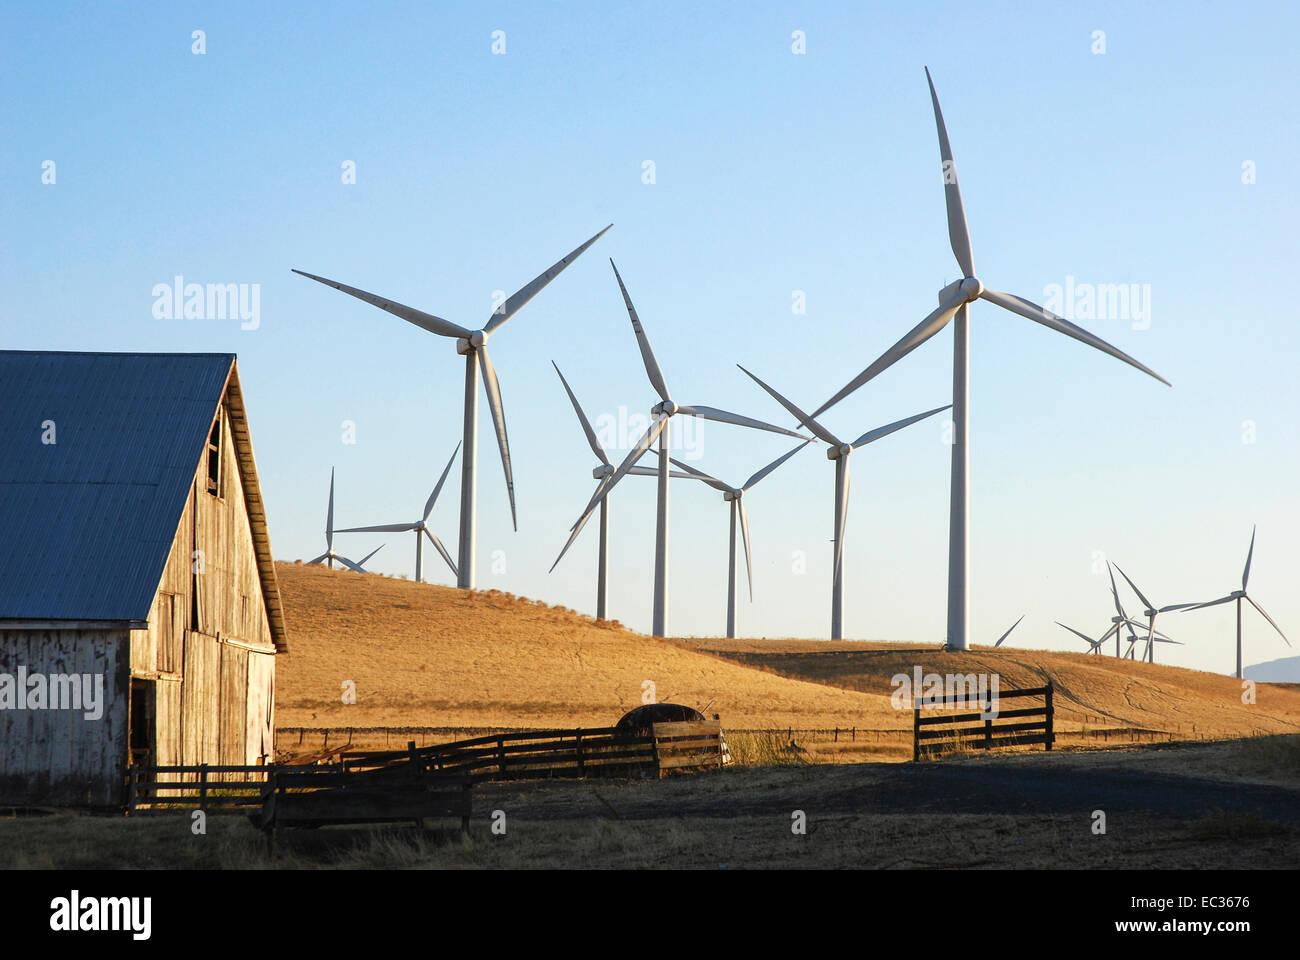 Parque eólico en terrenos agrícolas Imagen De Stock